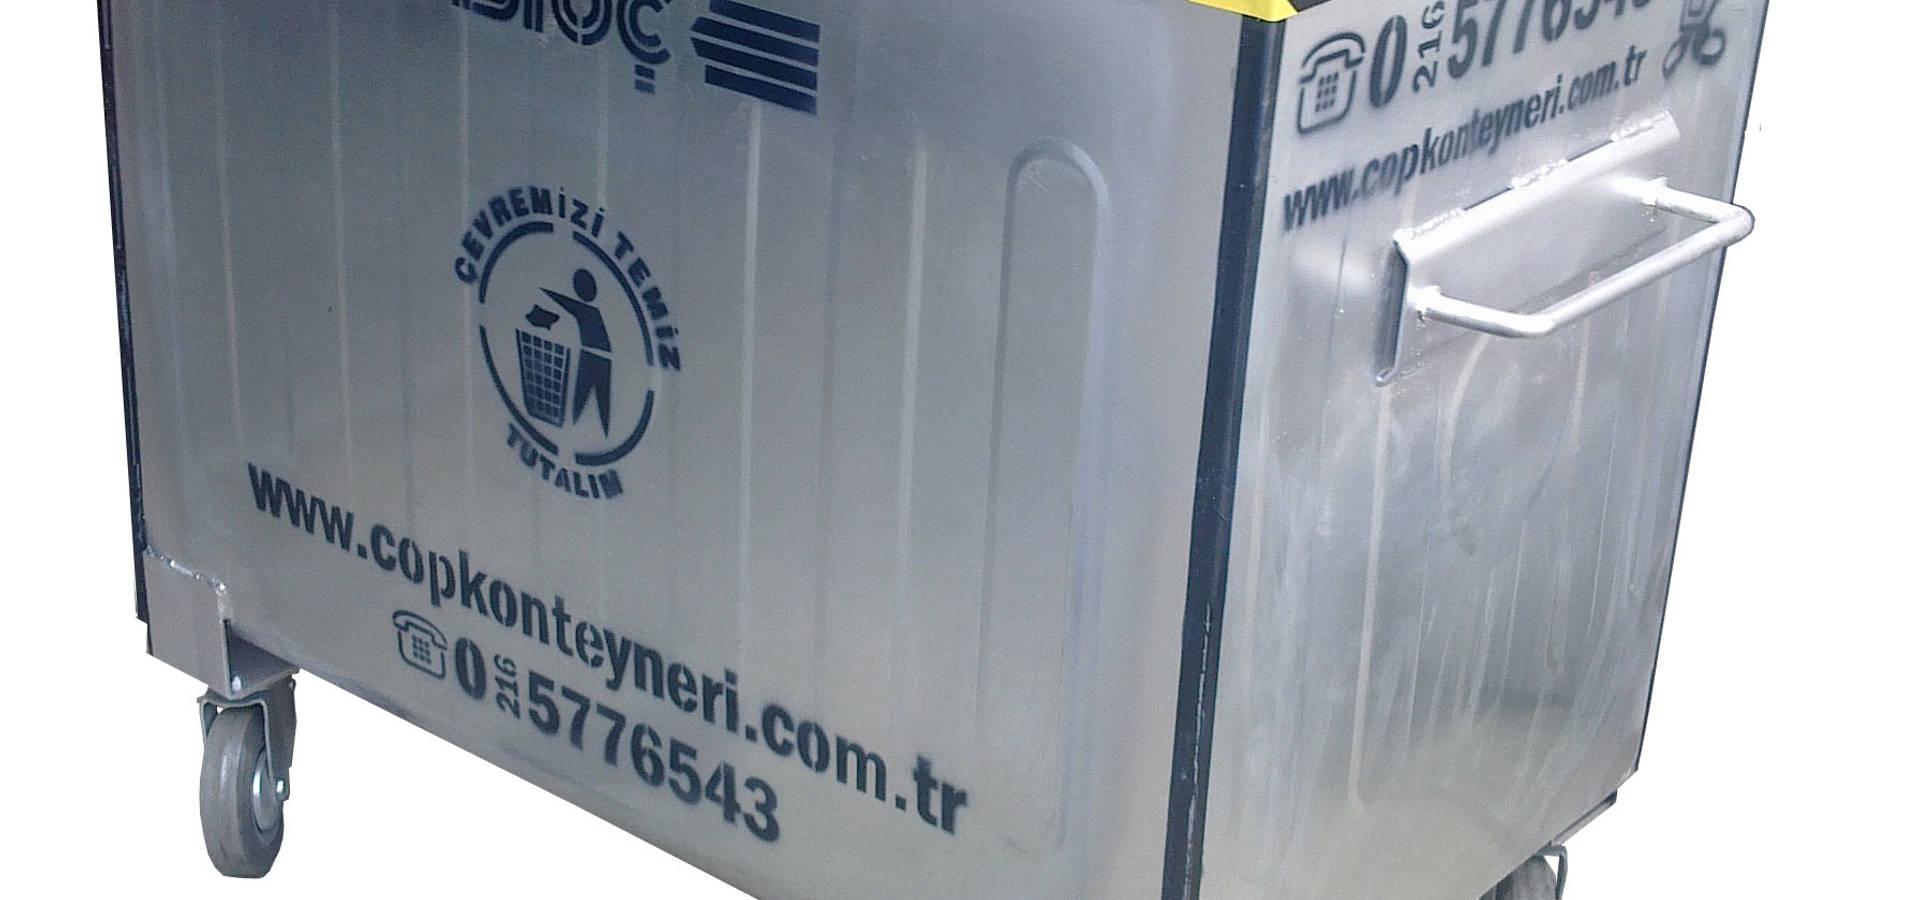 Çöp Konteyneri Waste Container